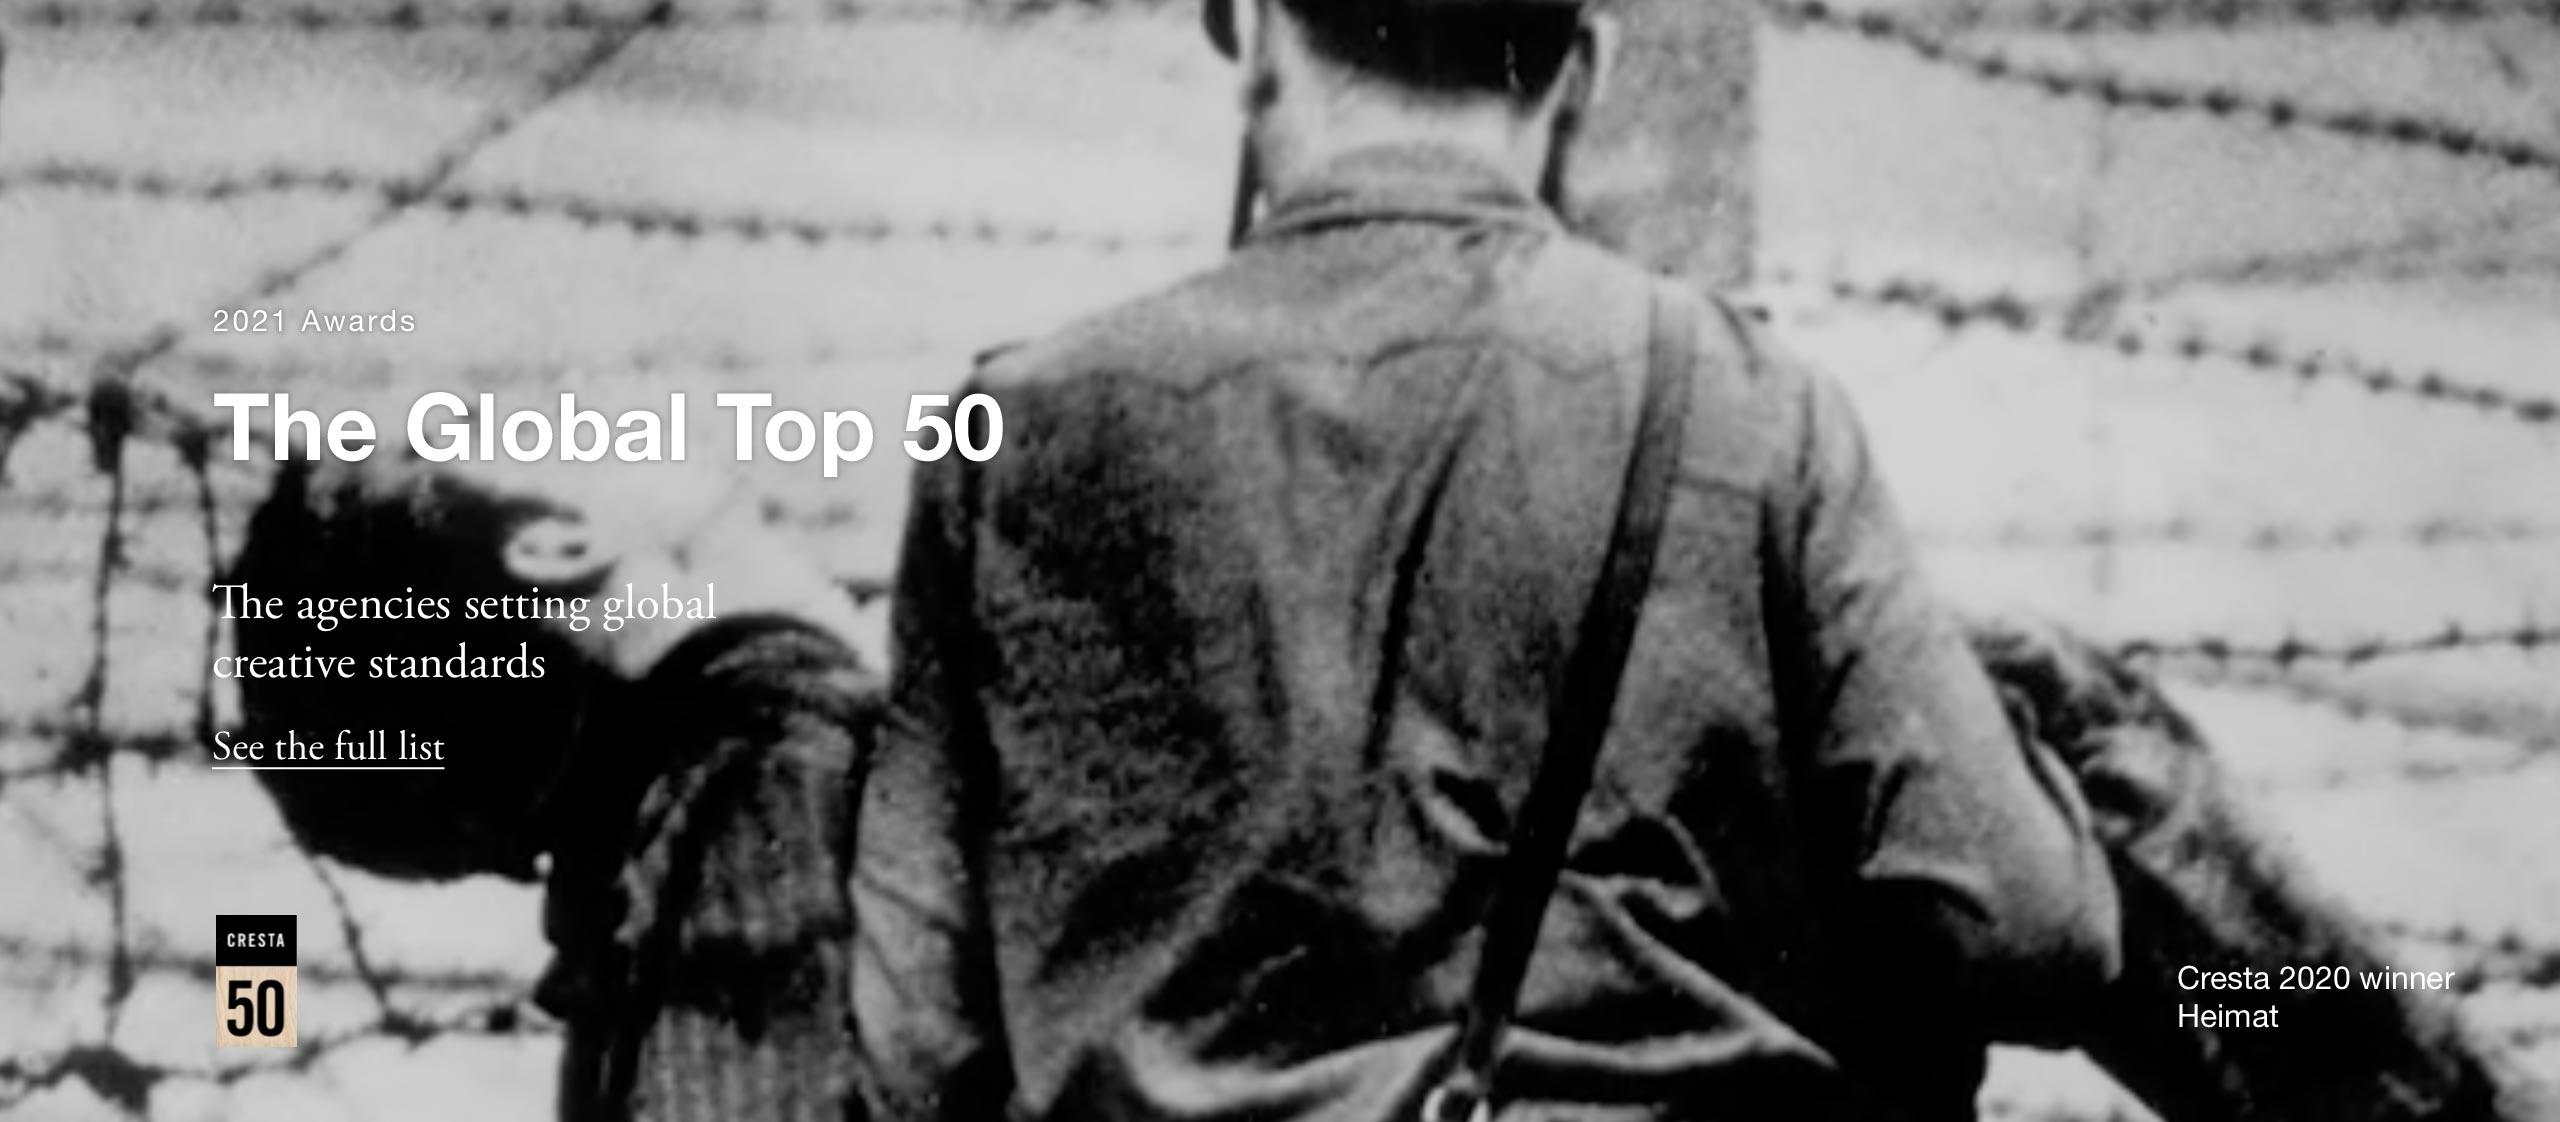 Cresta Global Top 50